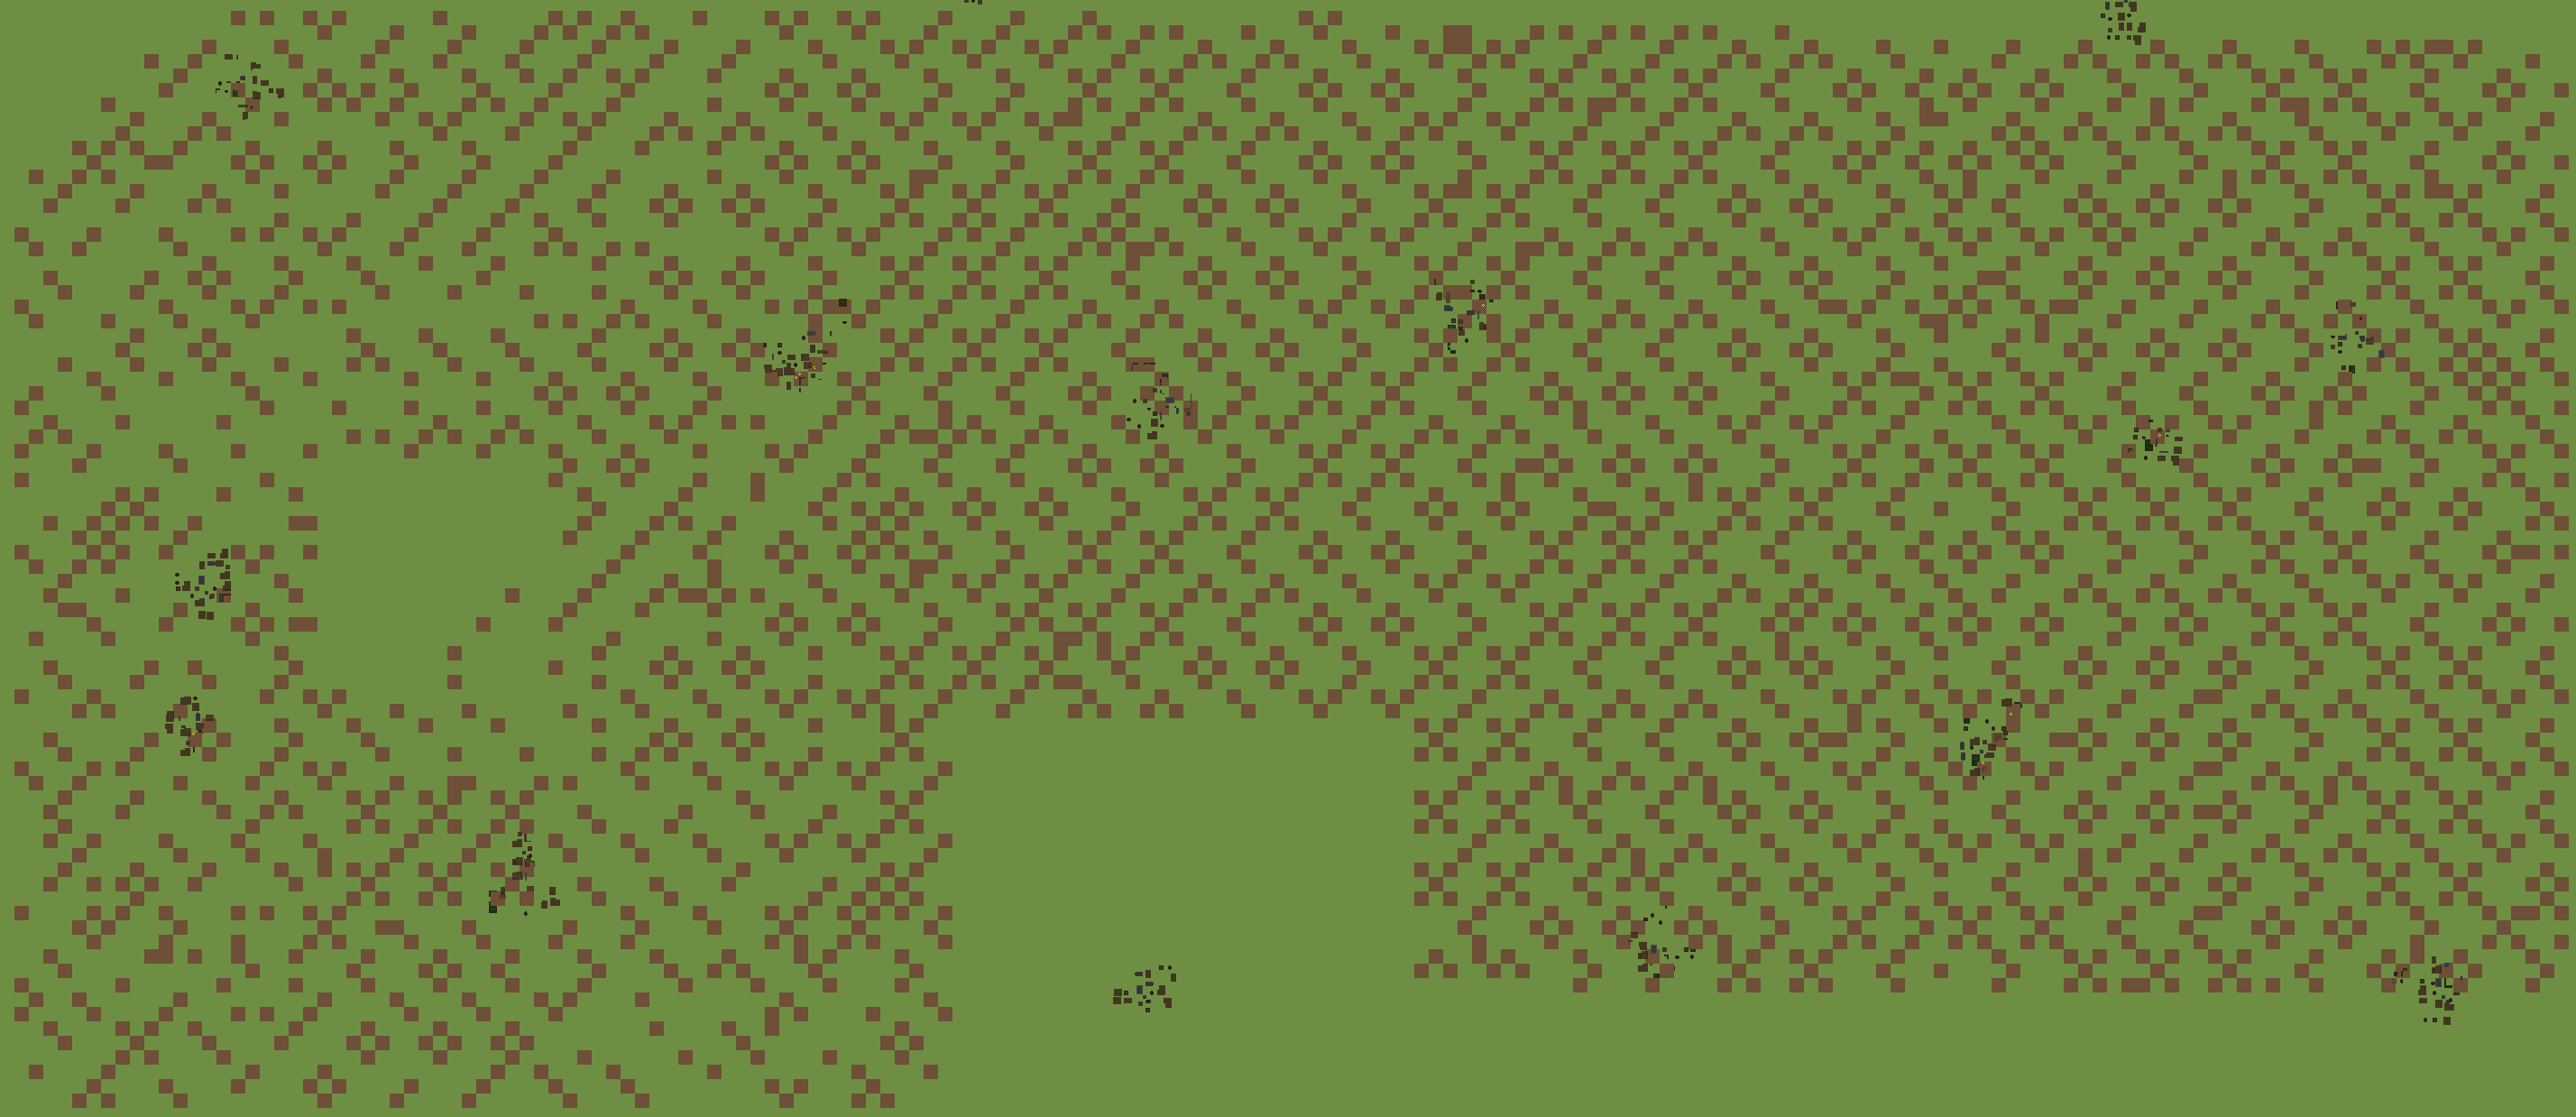 Mc 106606 giant dirt pillars in superflat world jira mapg gumiabroncs Image collections